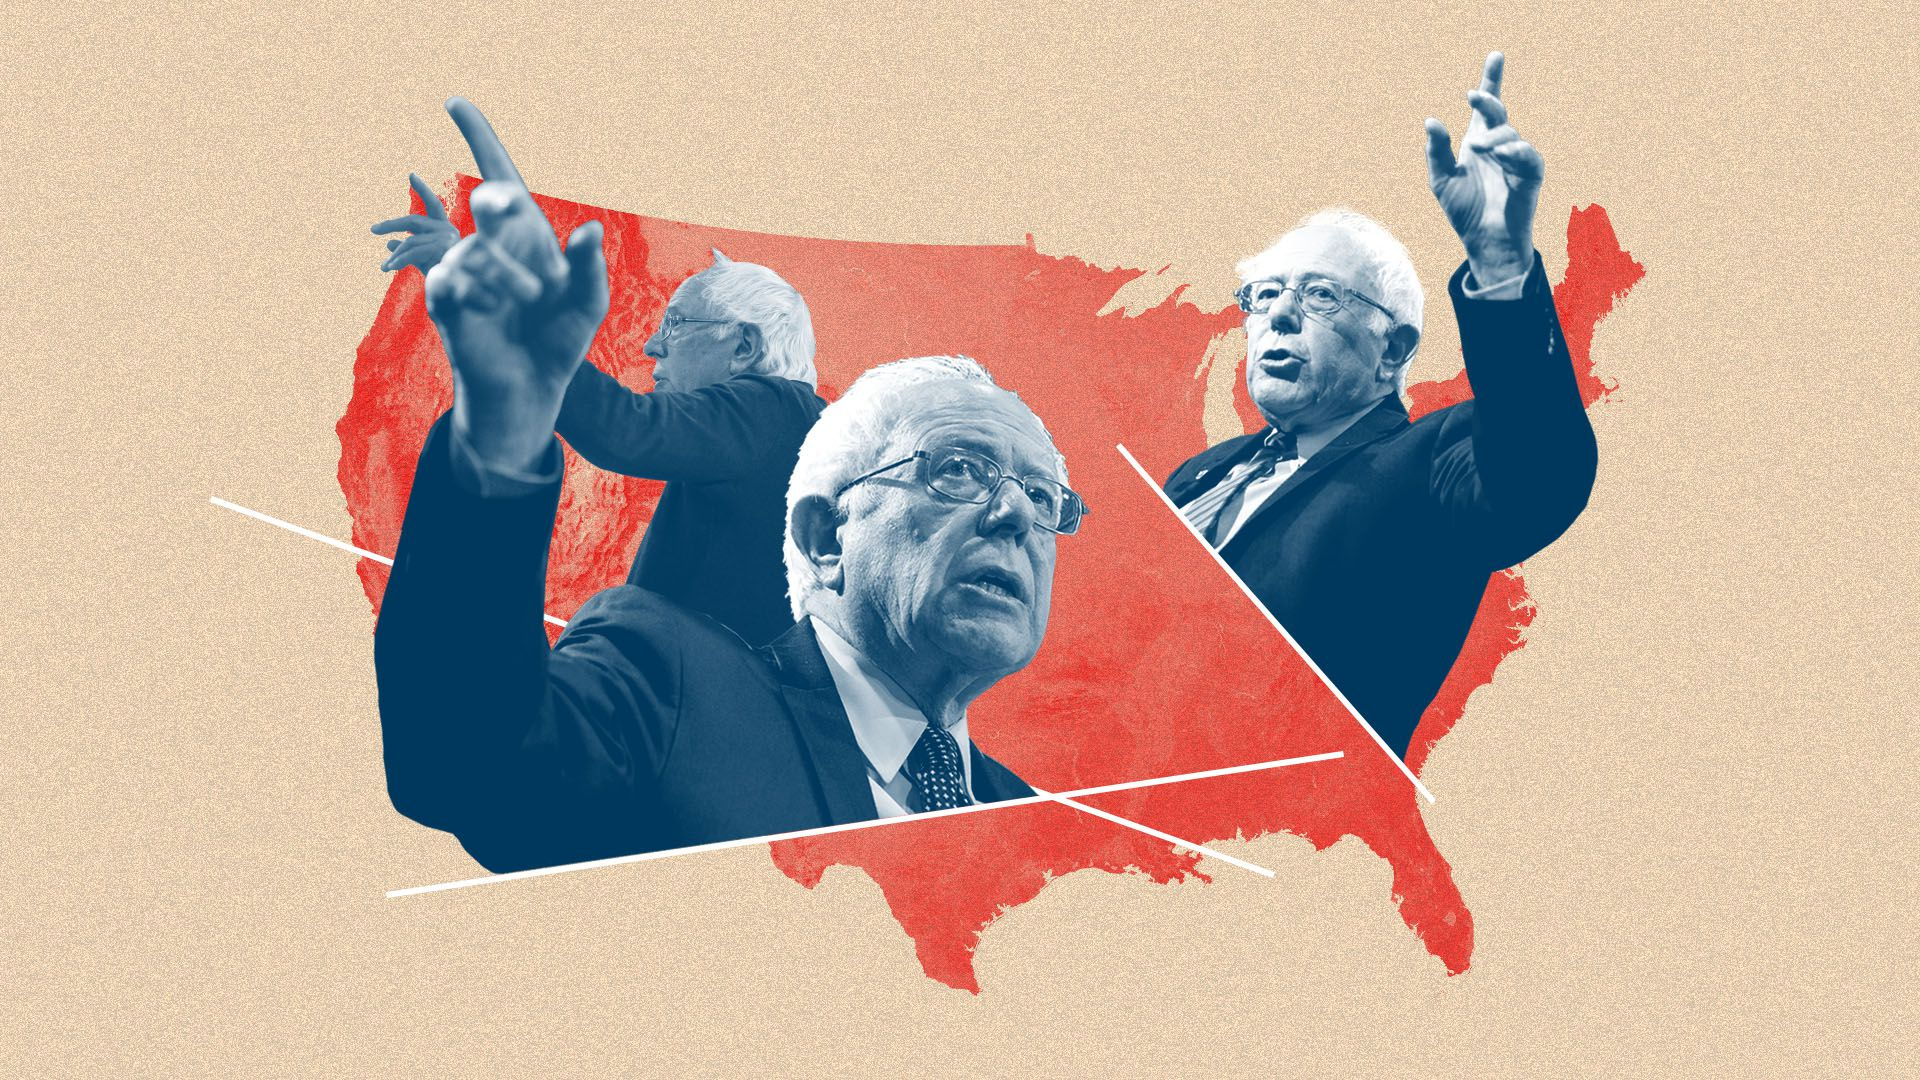 Illustration of multiple Bernie Sanders's hovering over the United States